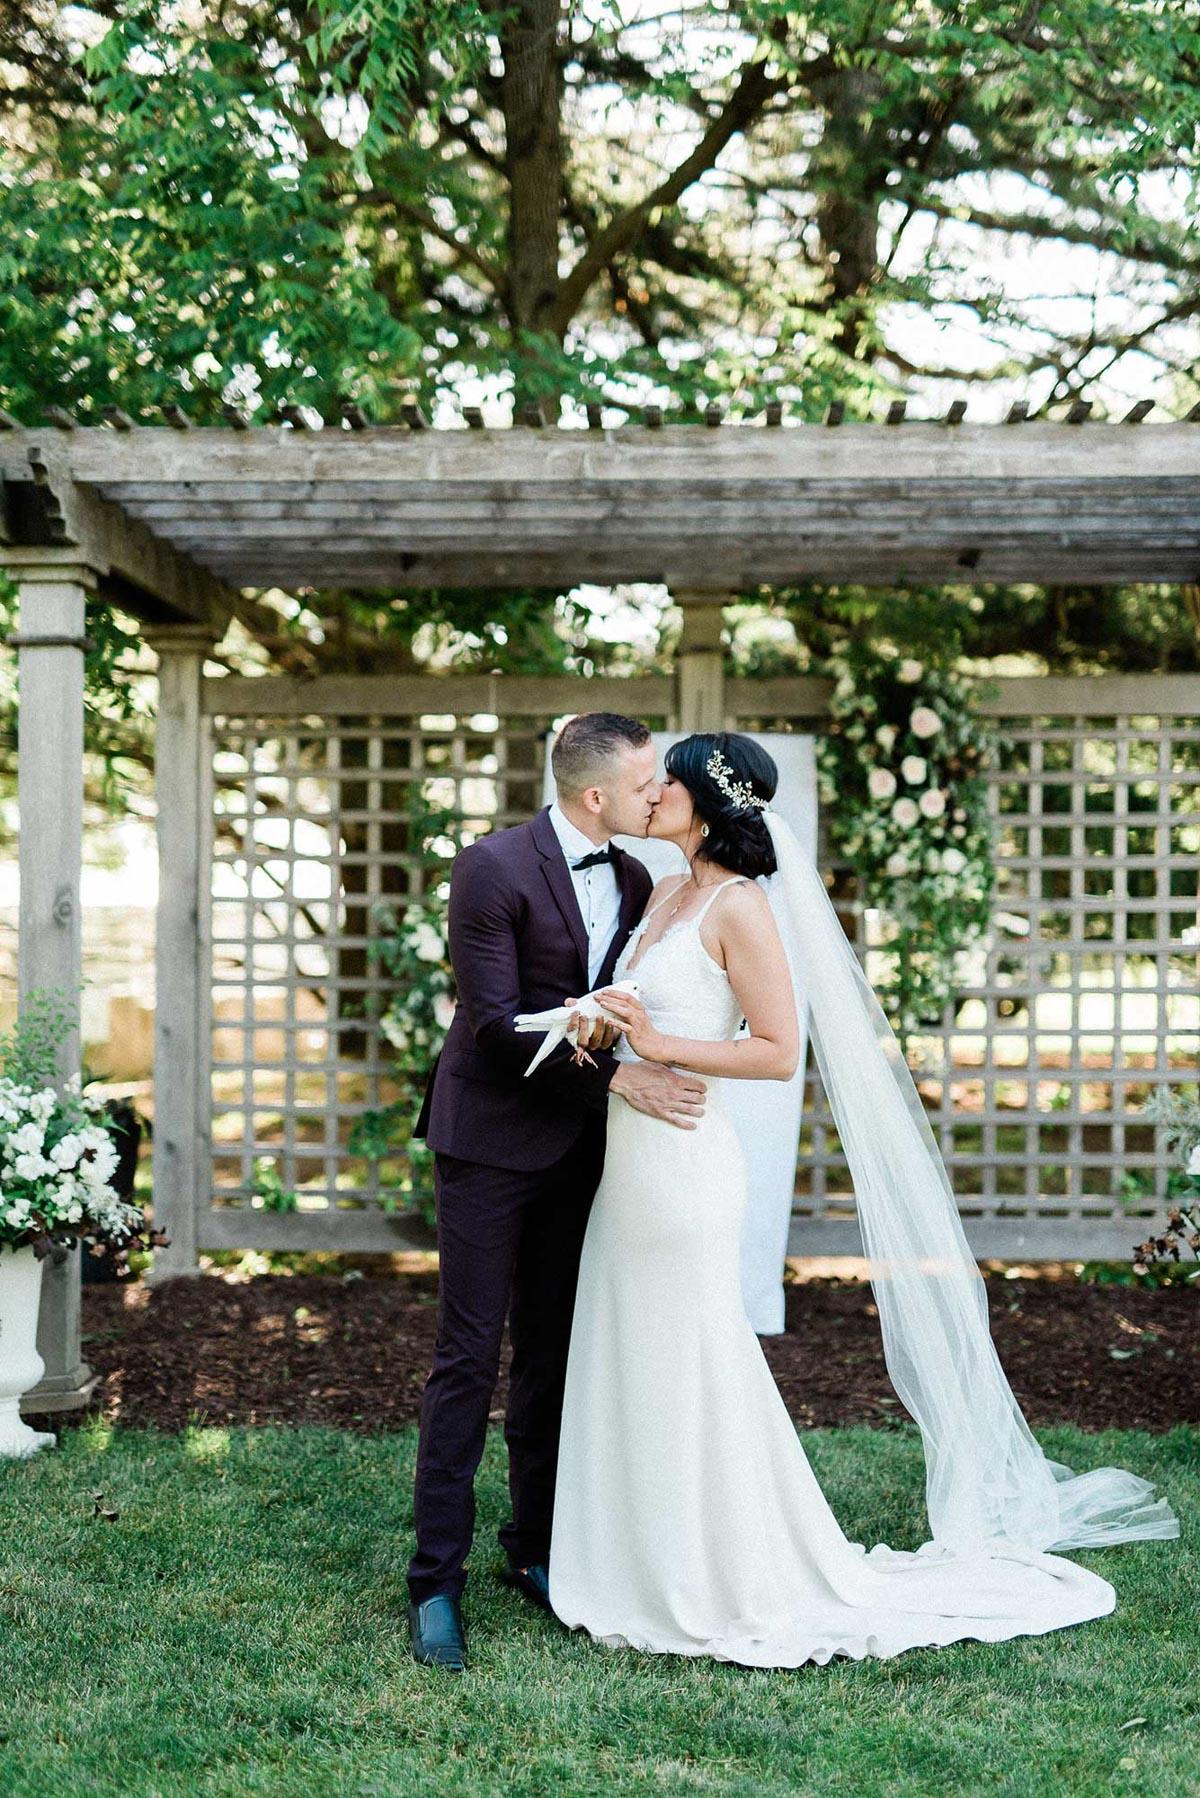 destiny-dawn-photography-vineyard-bride-swish-list-knollwood-golf-and-country-club-ancaster-wedding-editorial-5.jpg